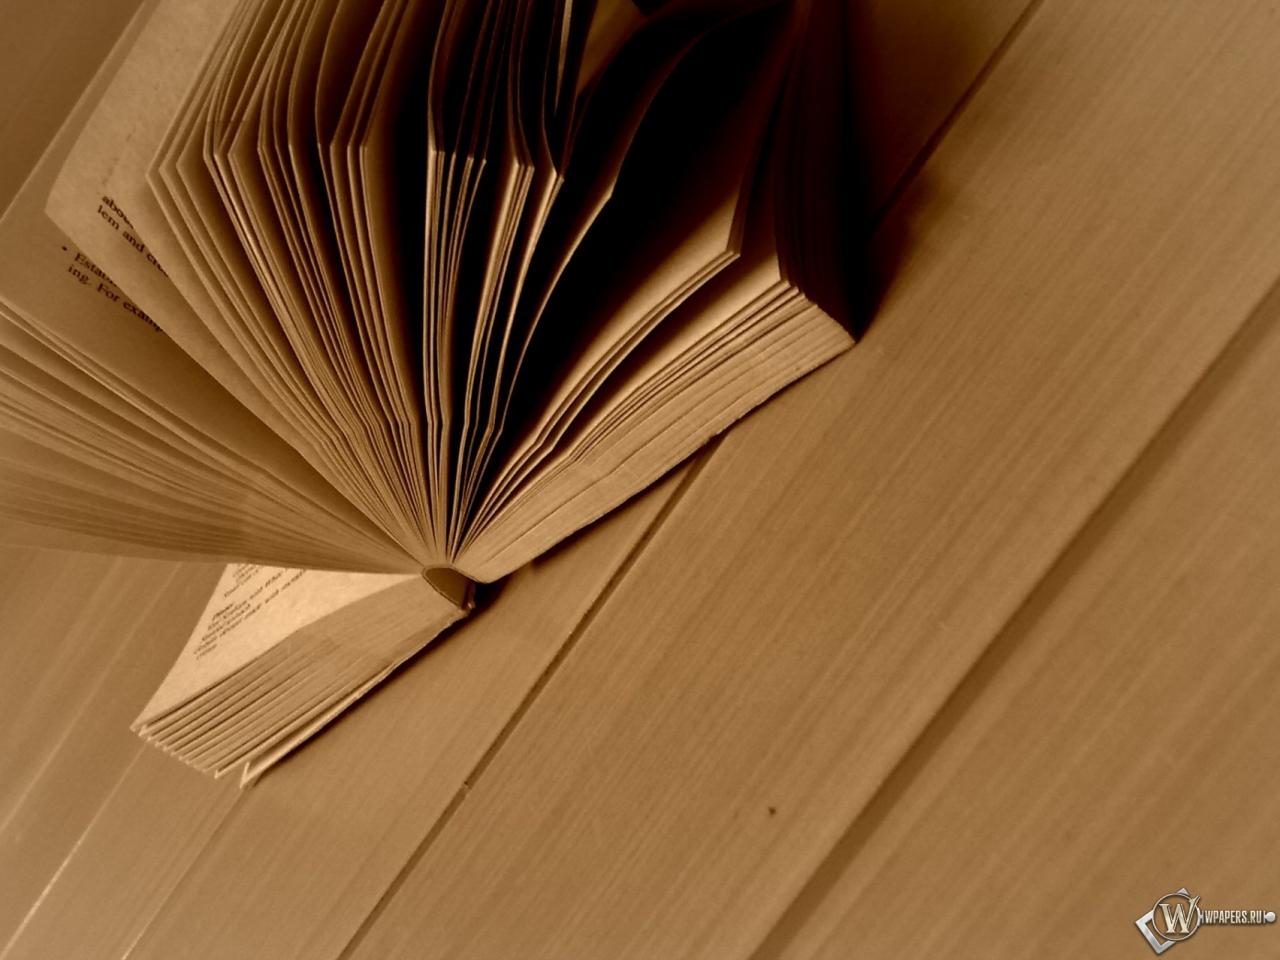 Развёрнутая книга 1280x960